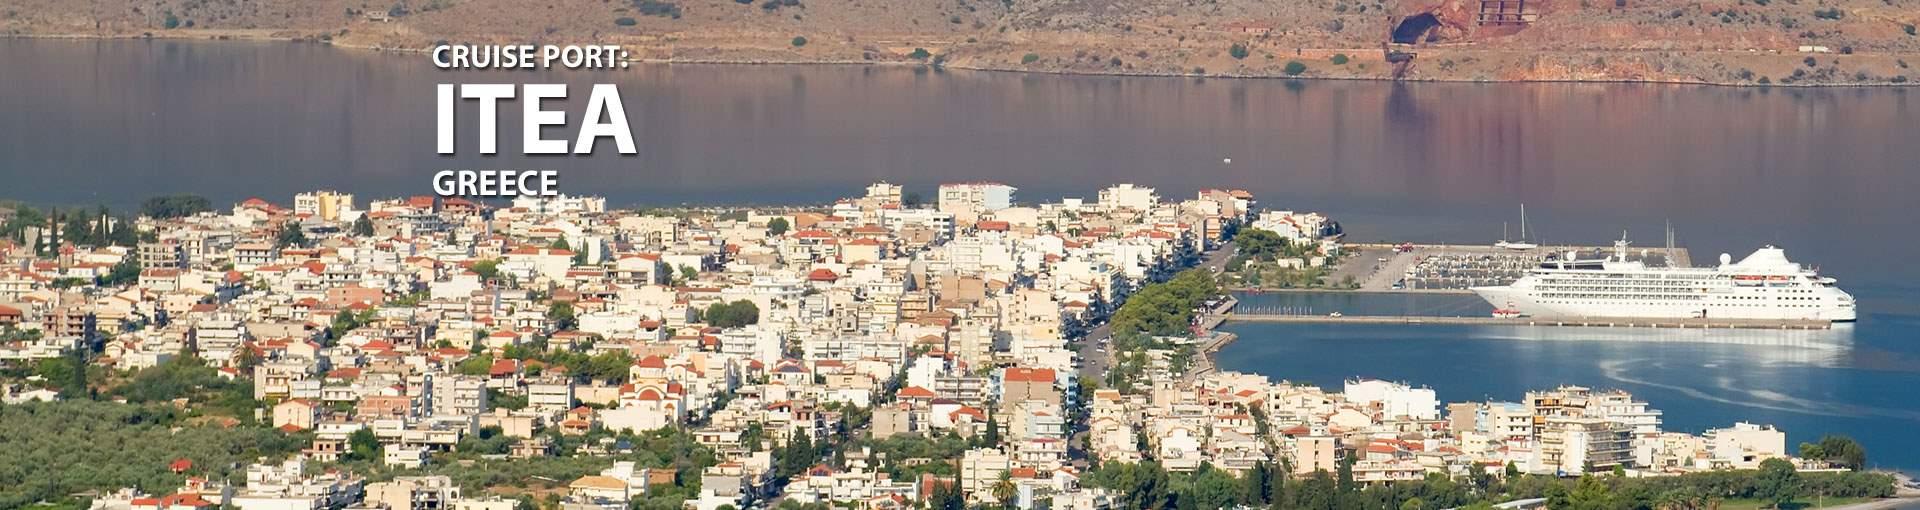 Cruises to Itea, Greece